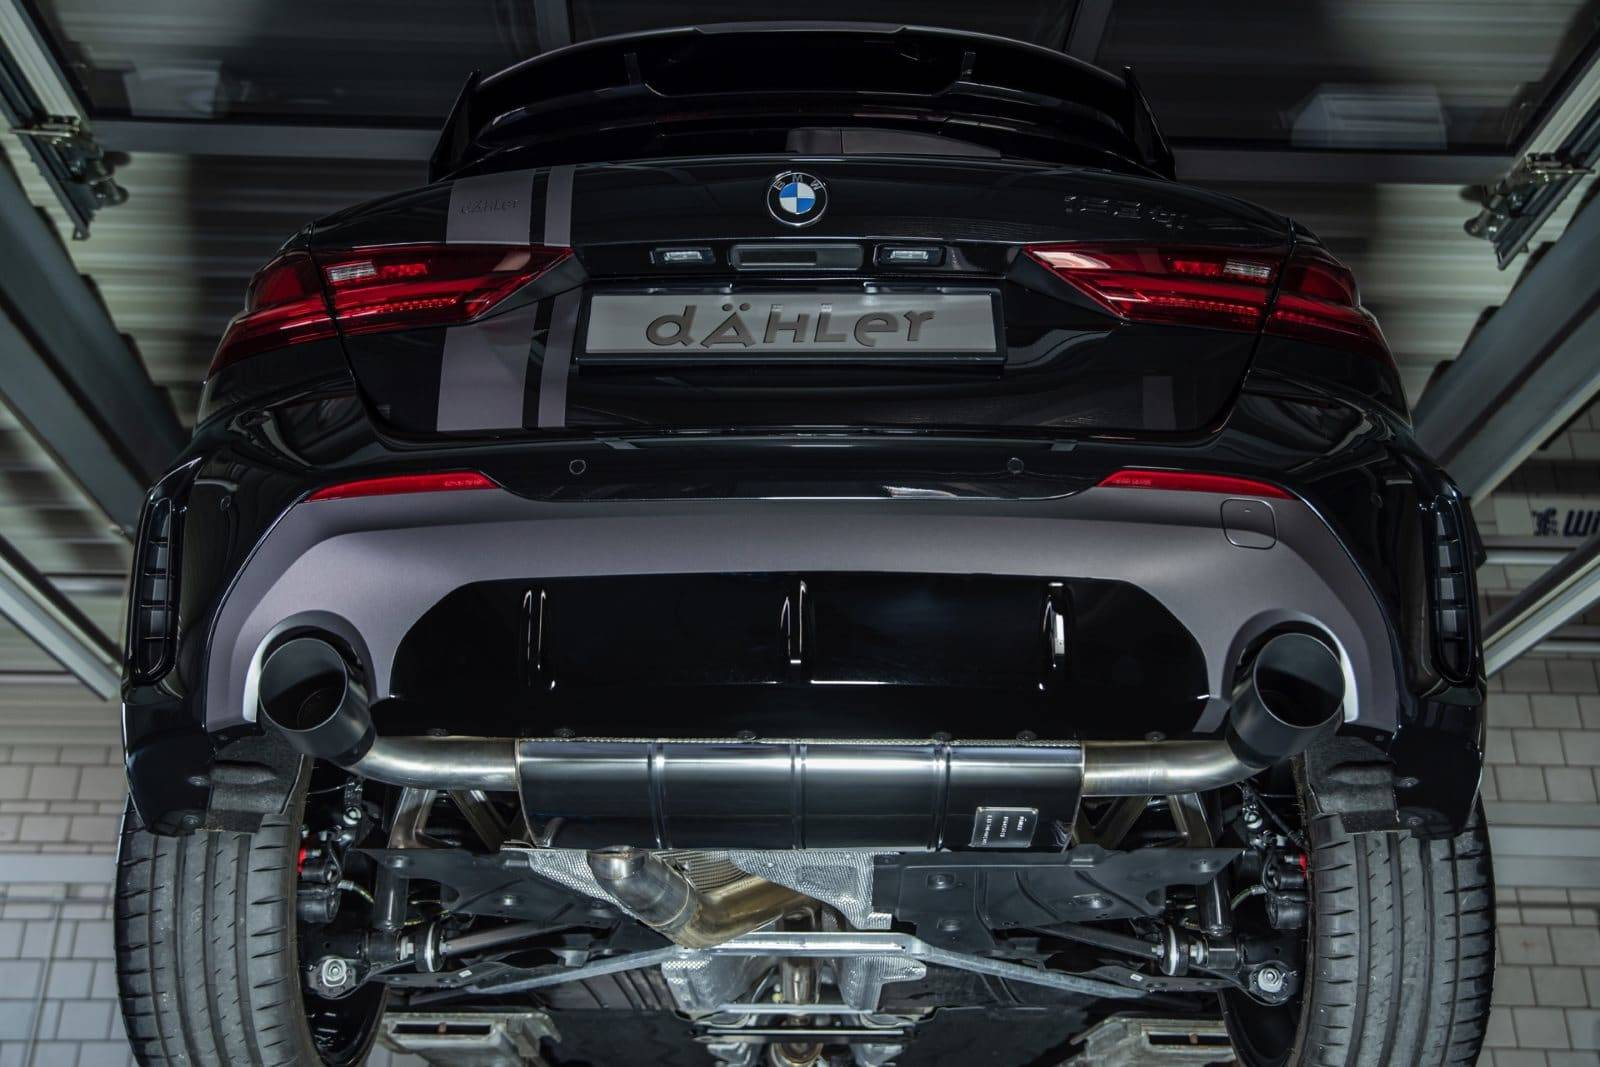 BMW 128tii F40 от ателье Dähler 7